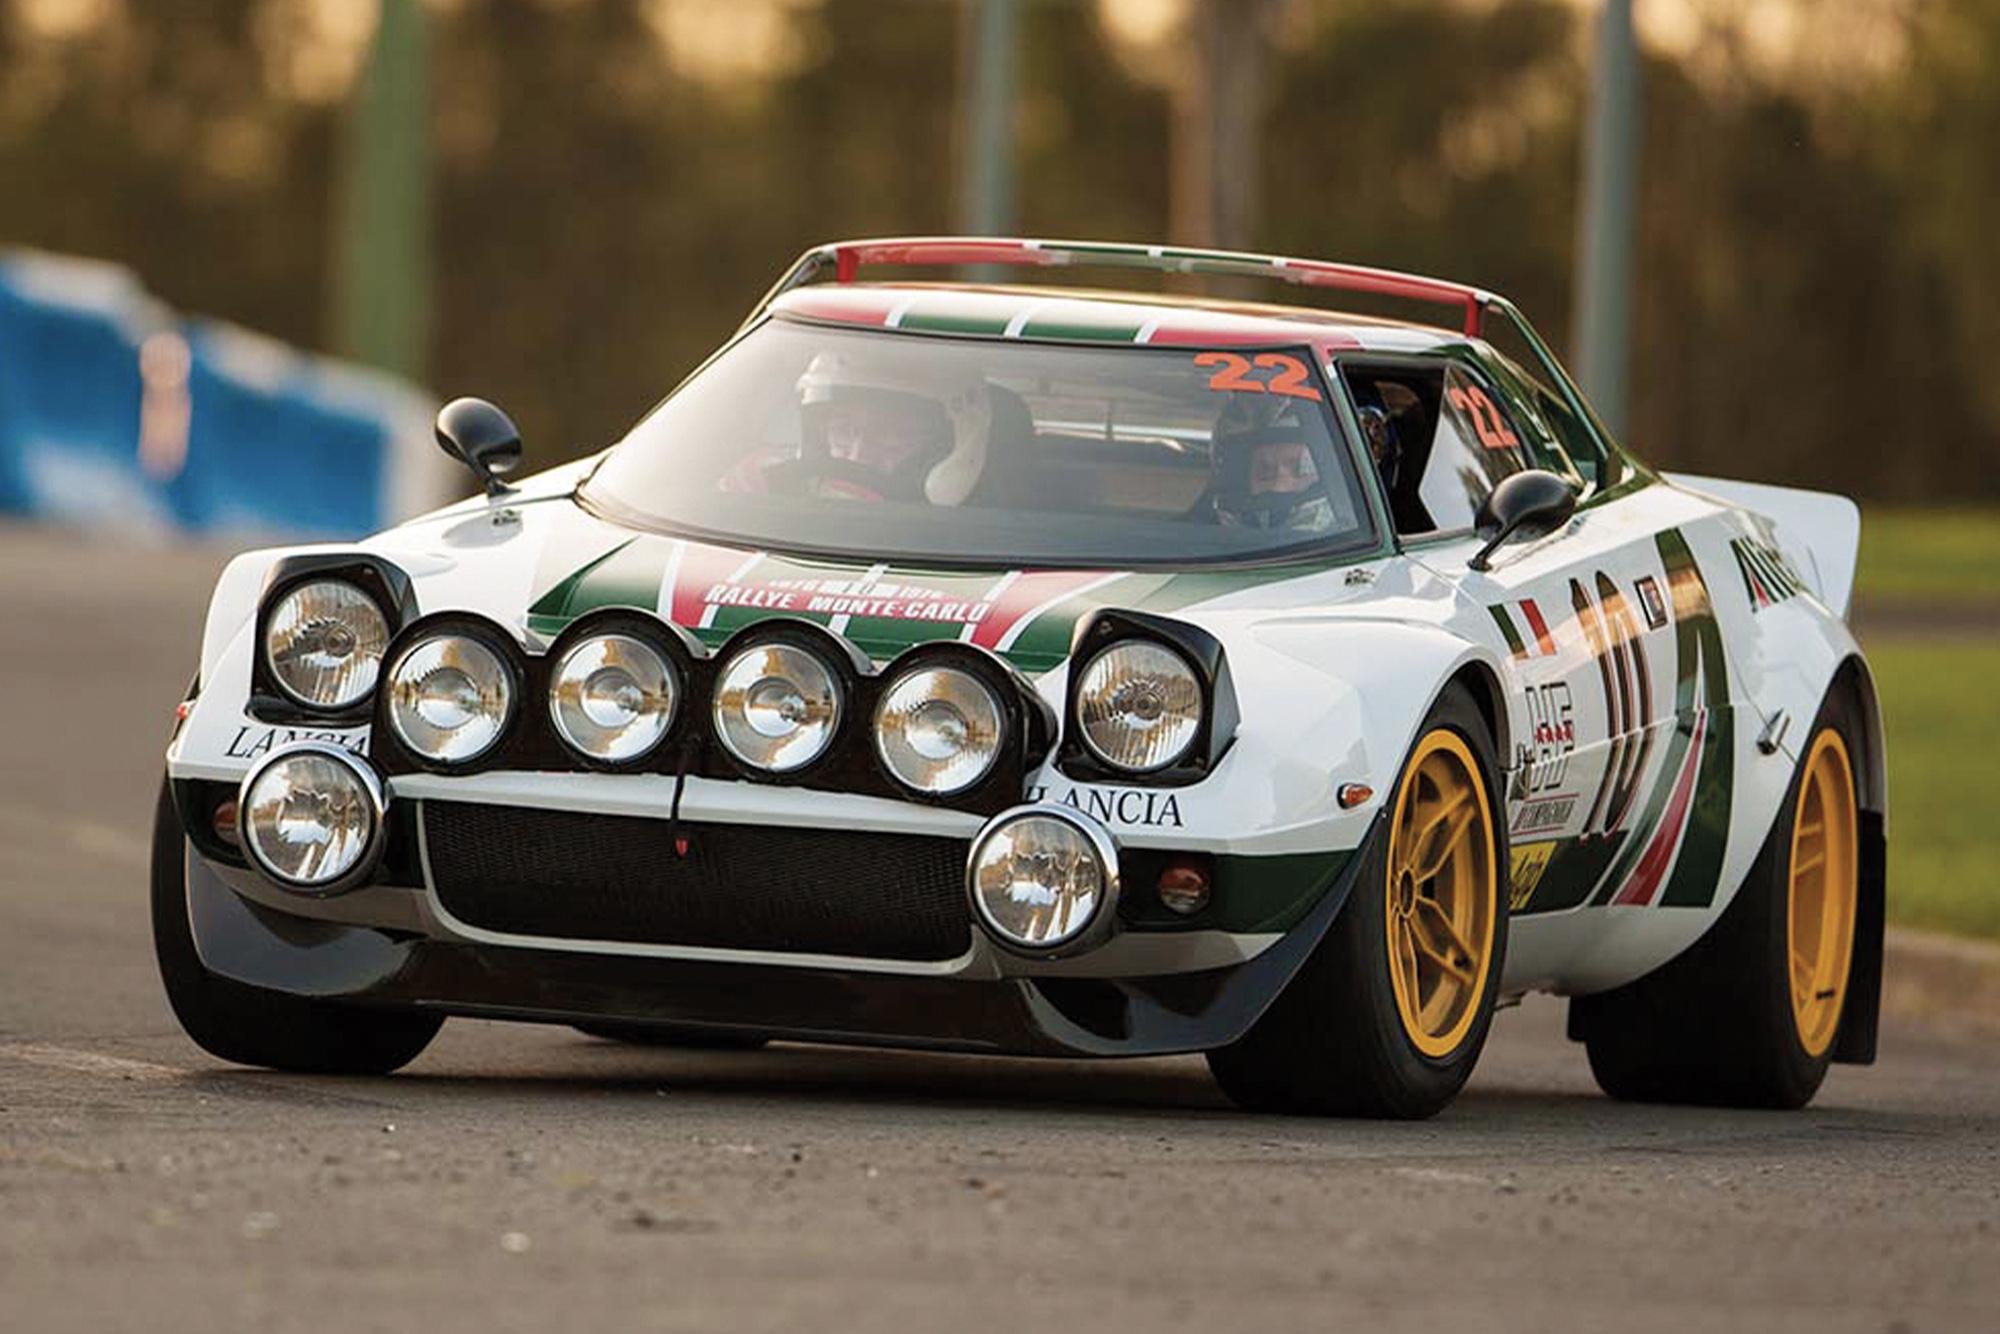 Lister STR Lancia Stratos